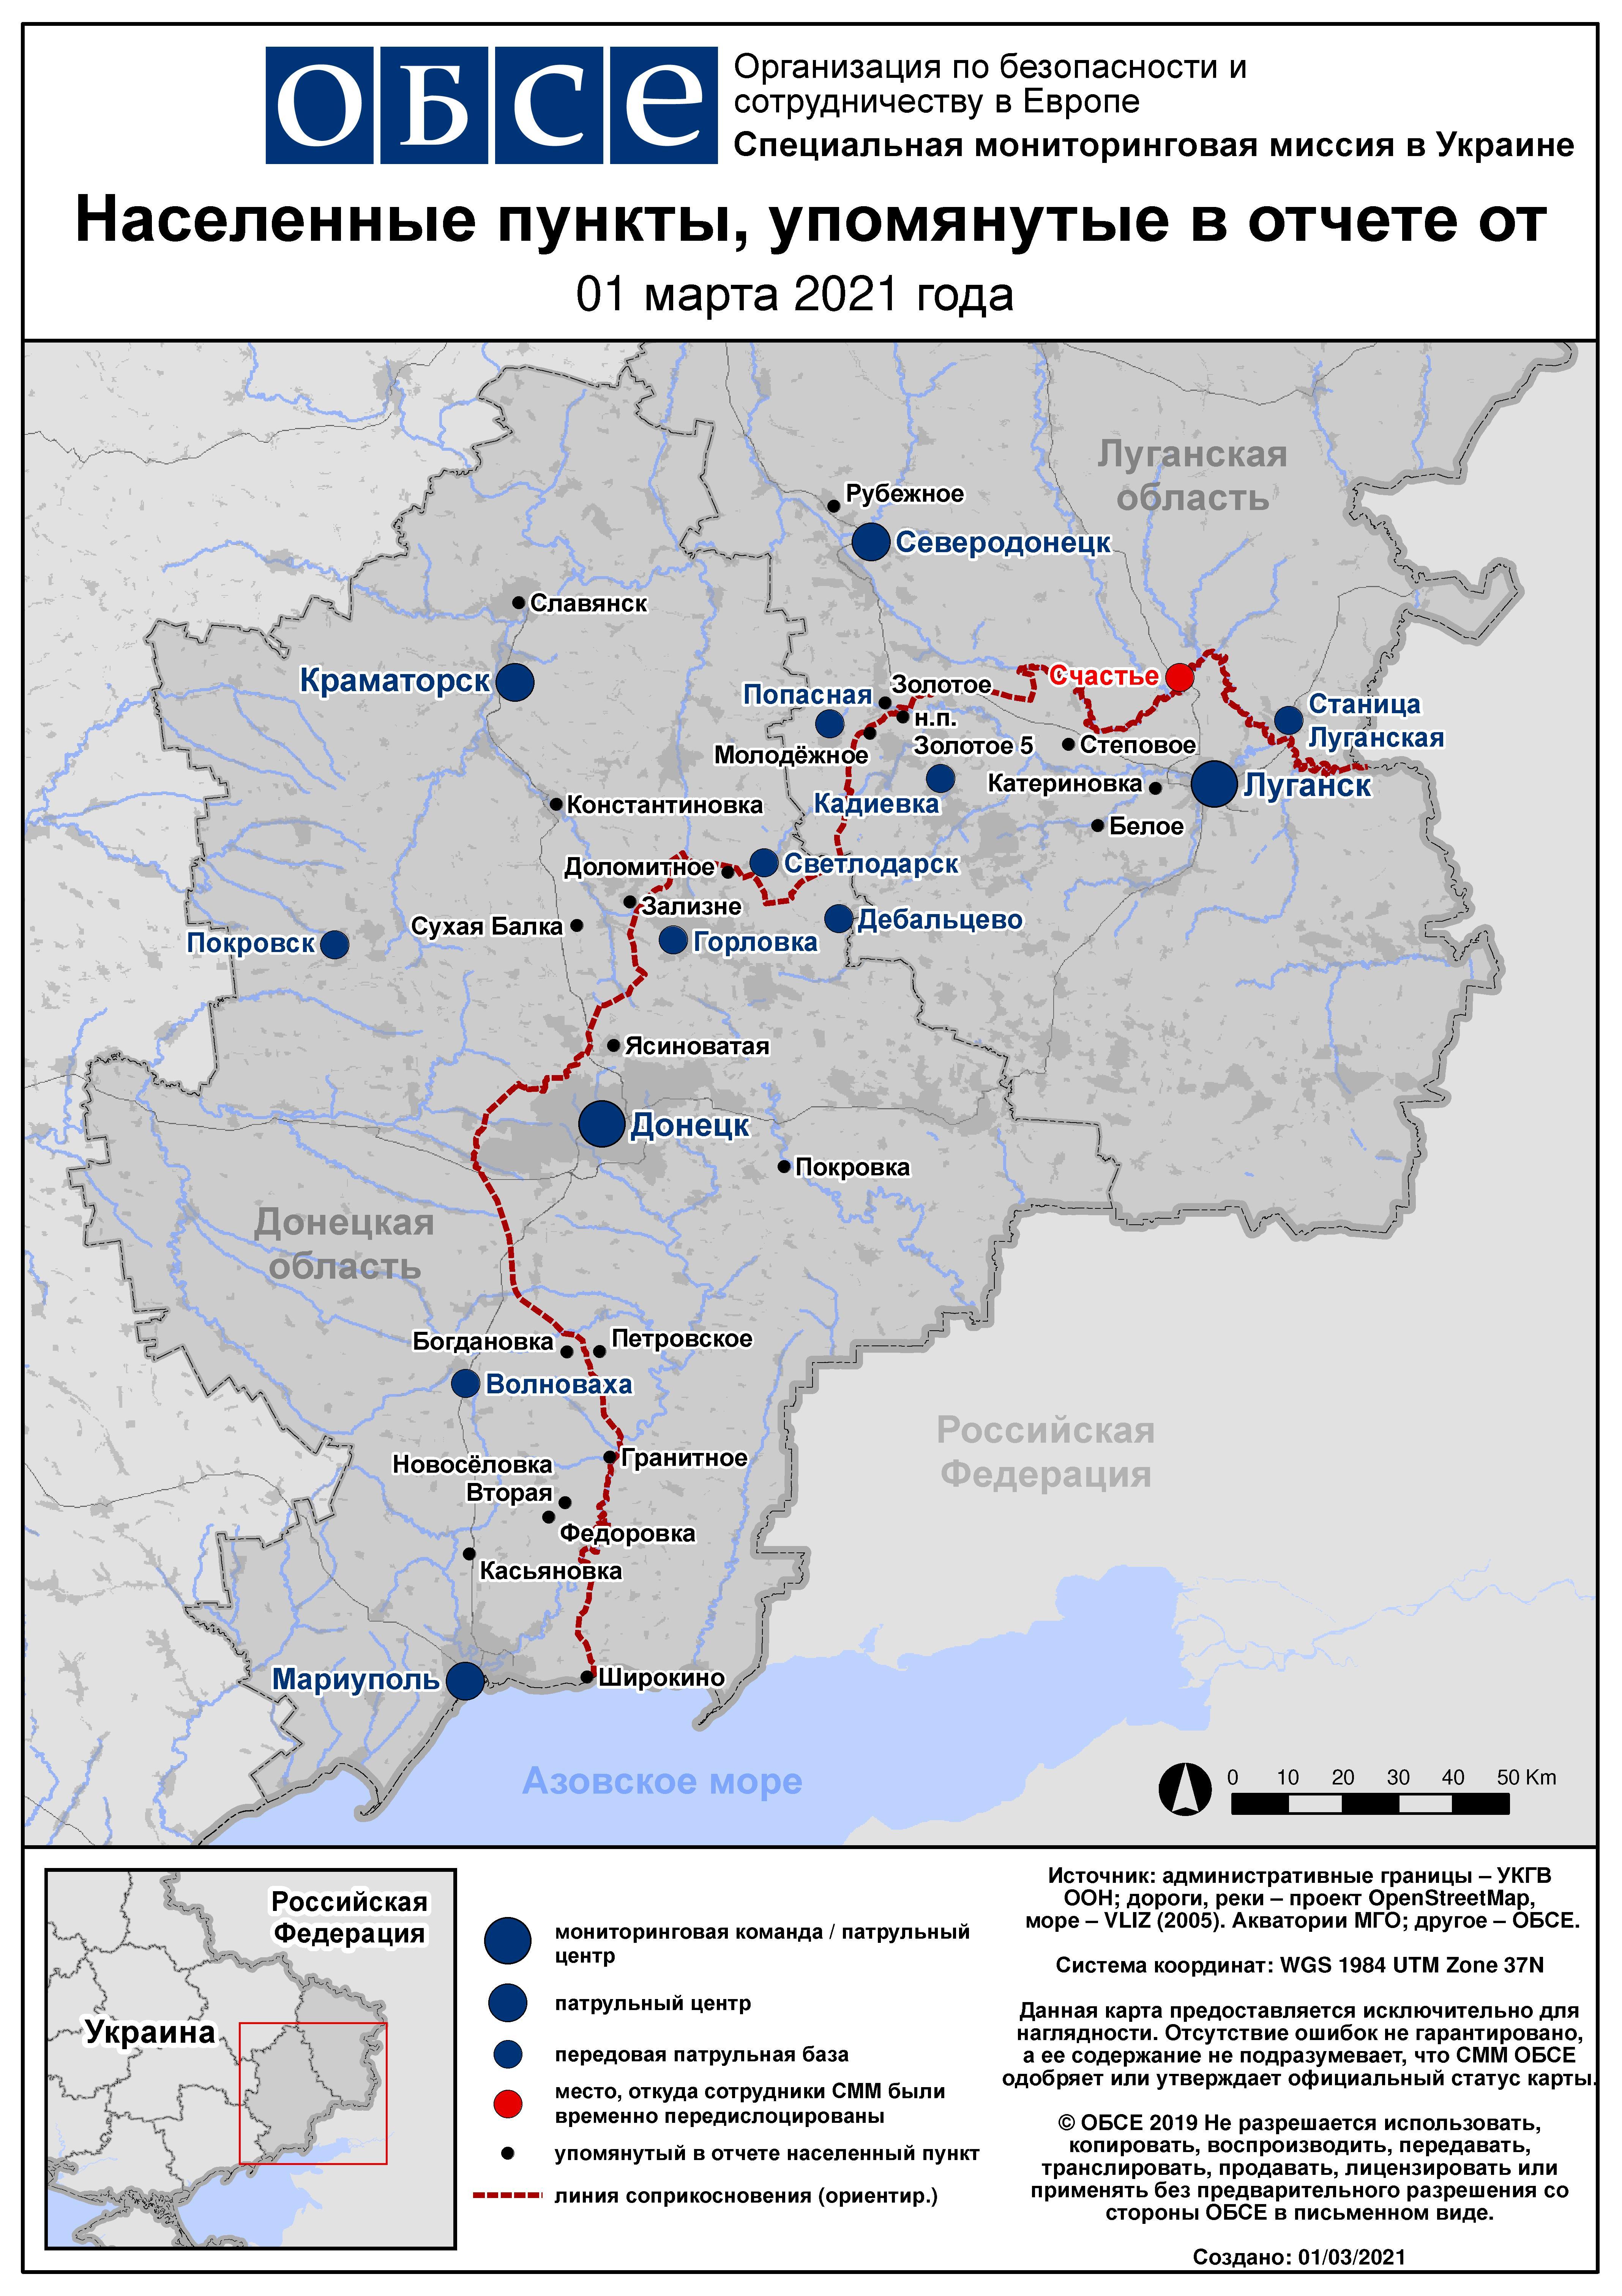 map_settlements--2021-02-28